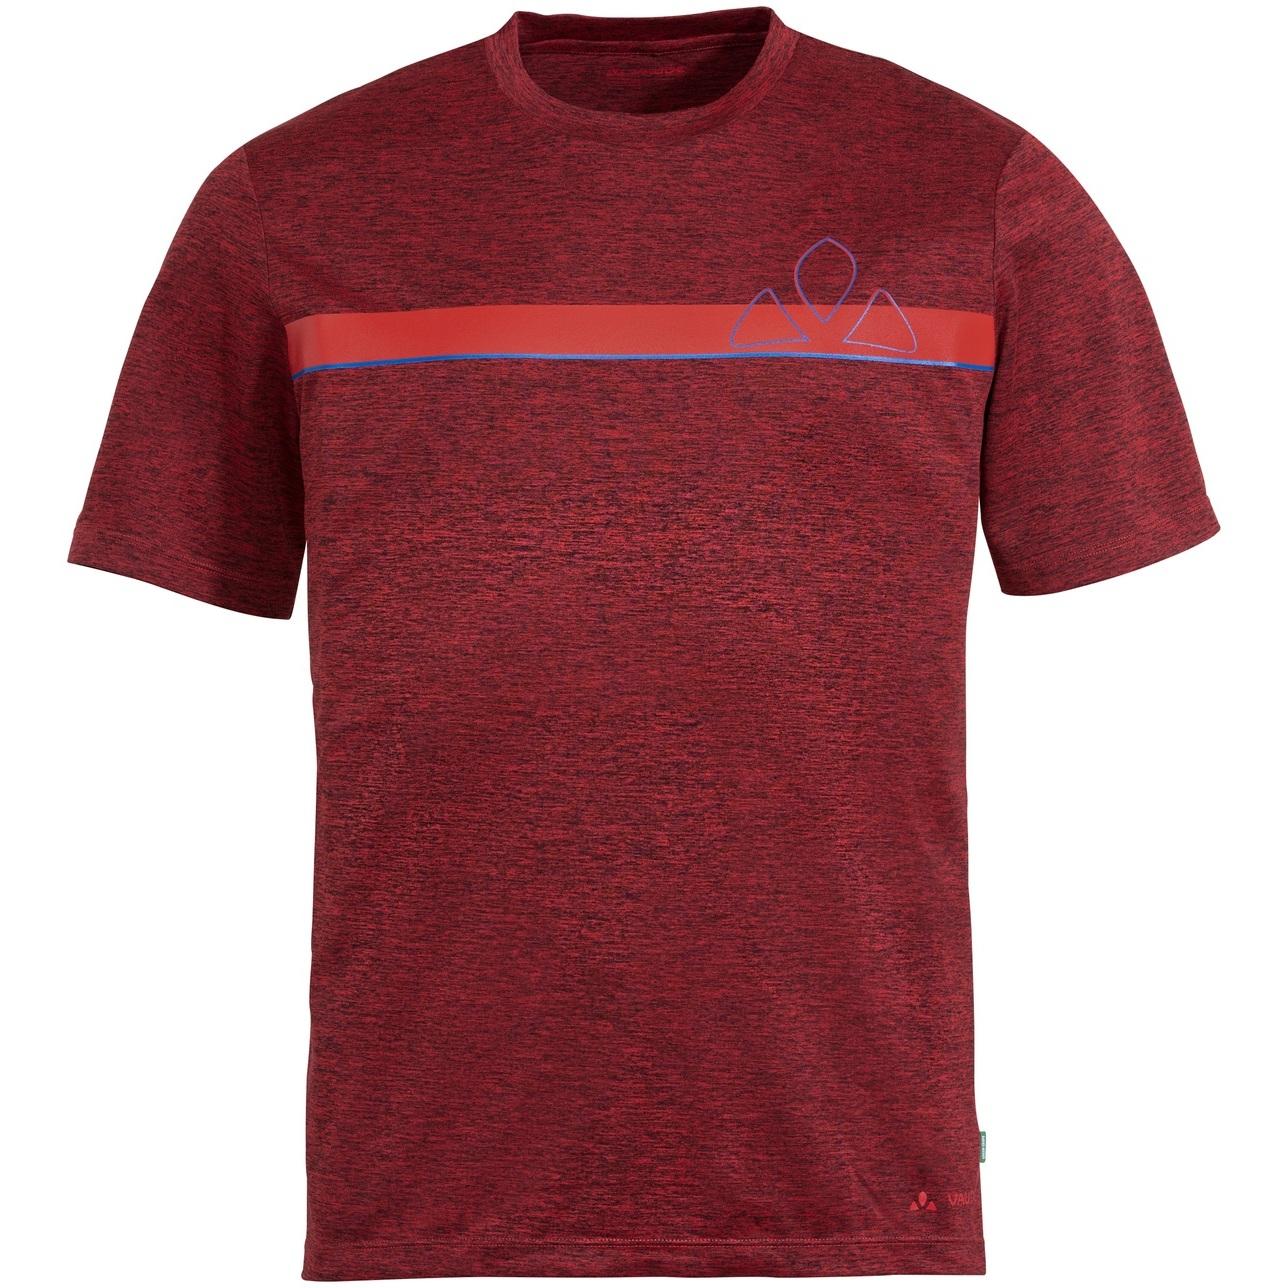 Vaude Bracket T-Shirt - carmine